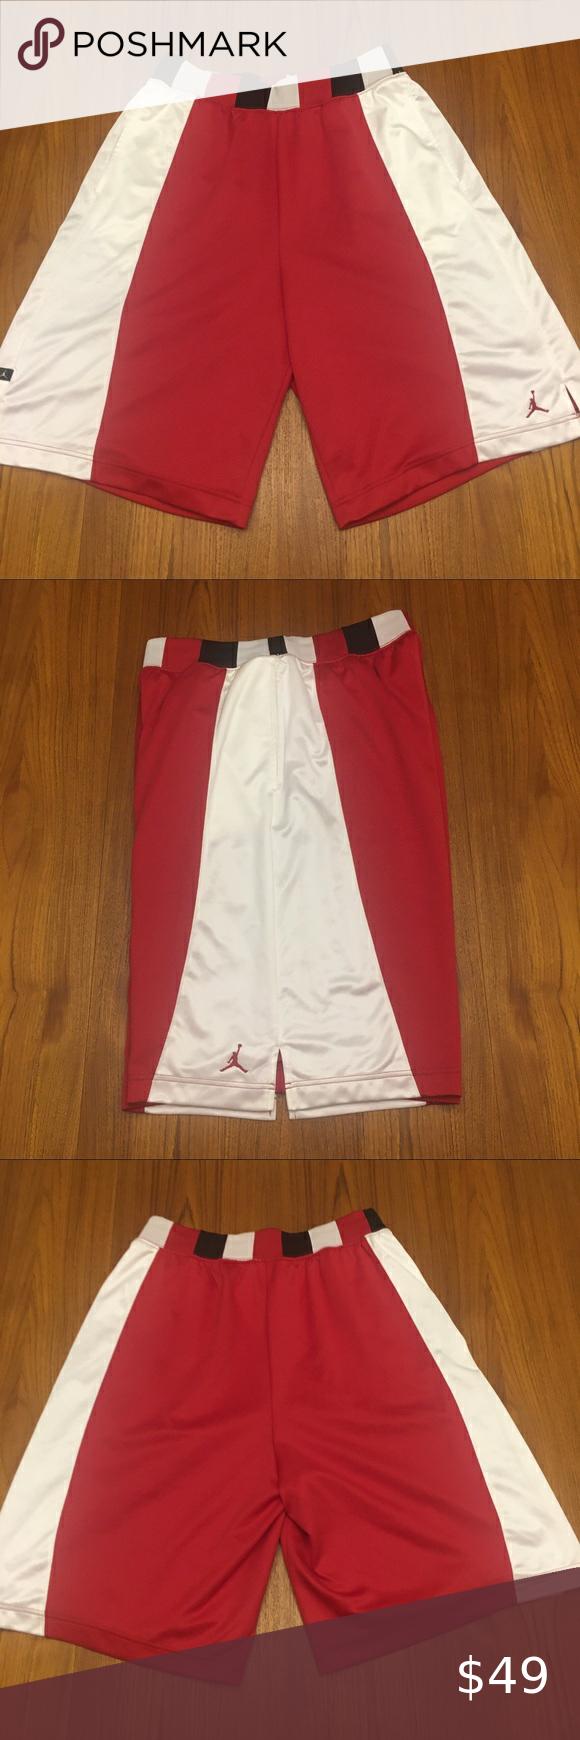 Sold Vintage Nike Air Jordan Shorts Xl 2005 In 2020 Vintage Nike Clothes Design Jordan Shorts